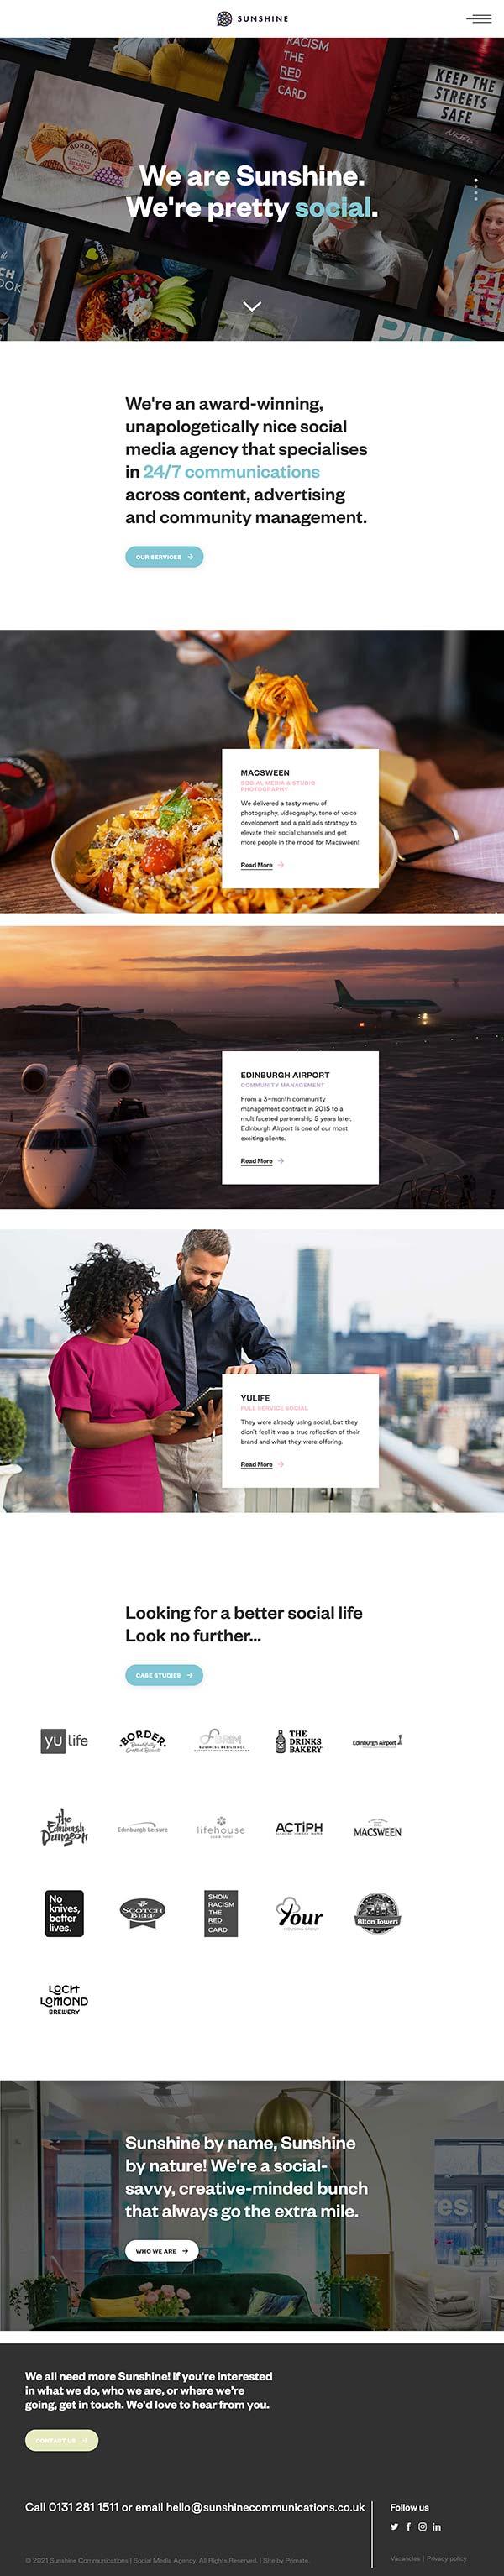 Sunshine Communications homepage